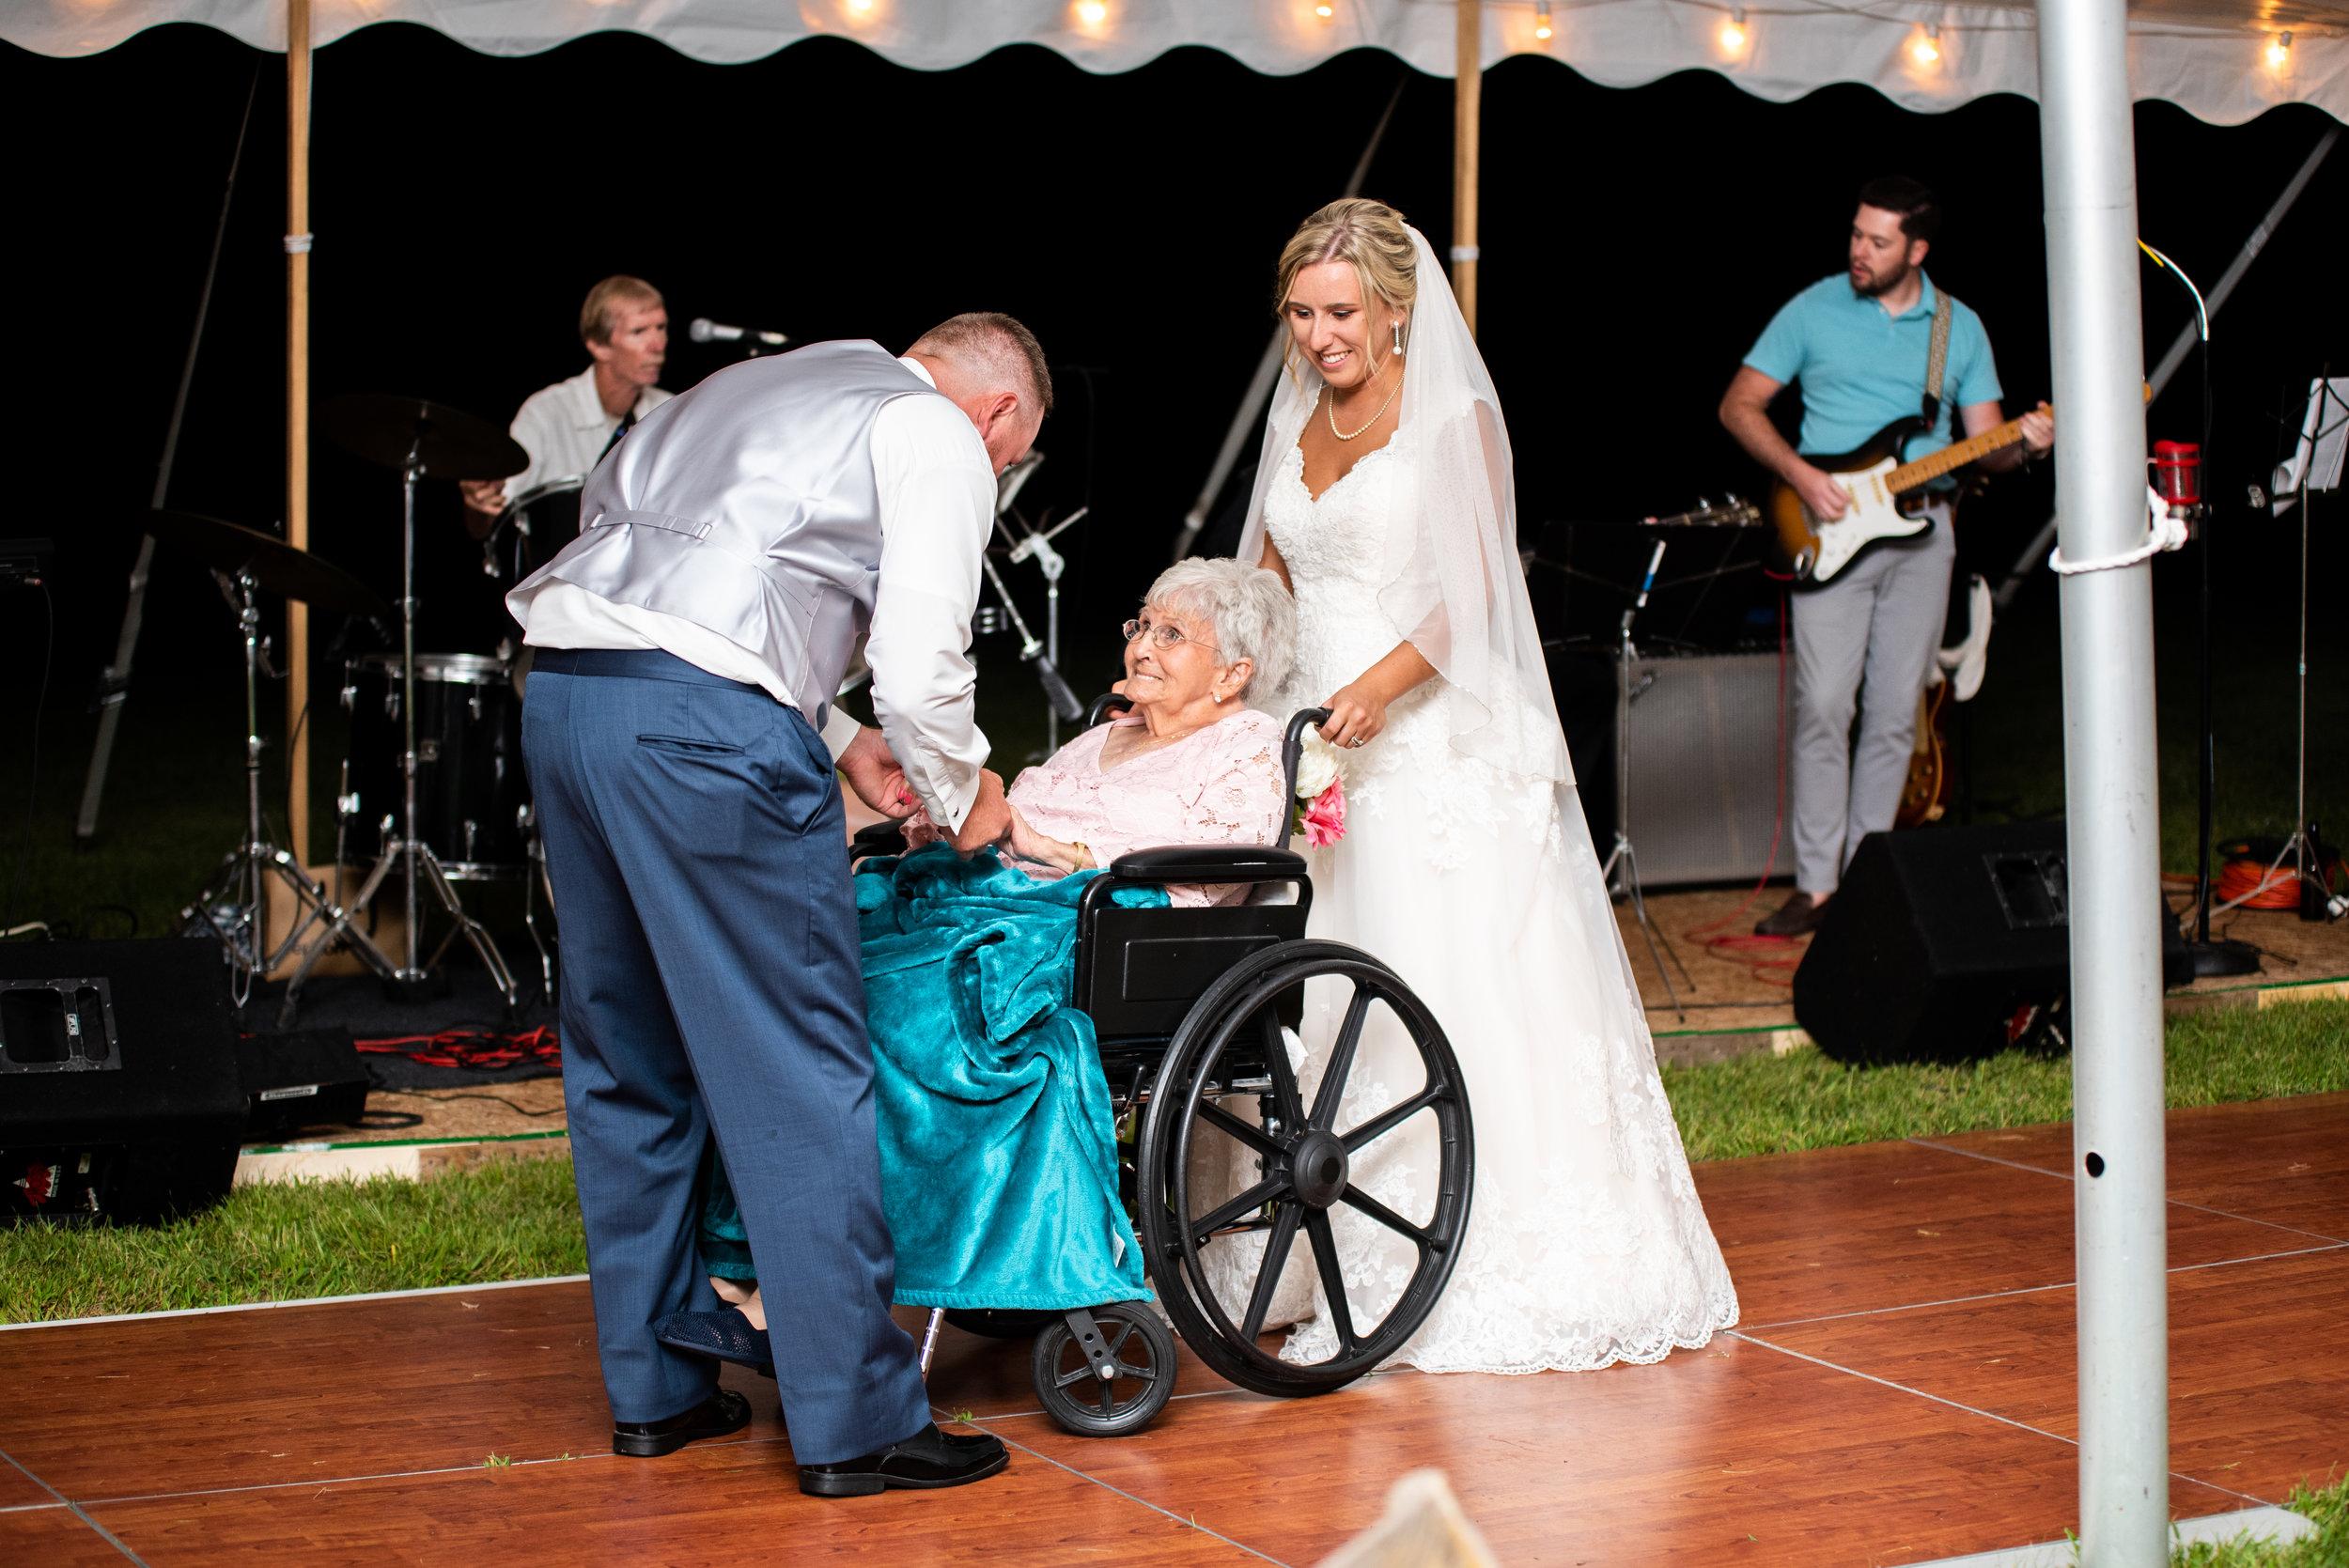 wedding (1 of 1)-223.jpg